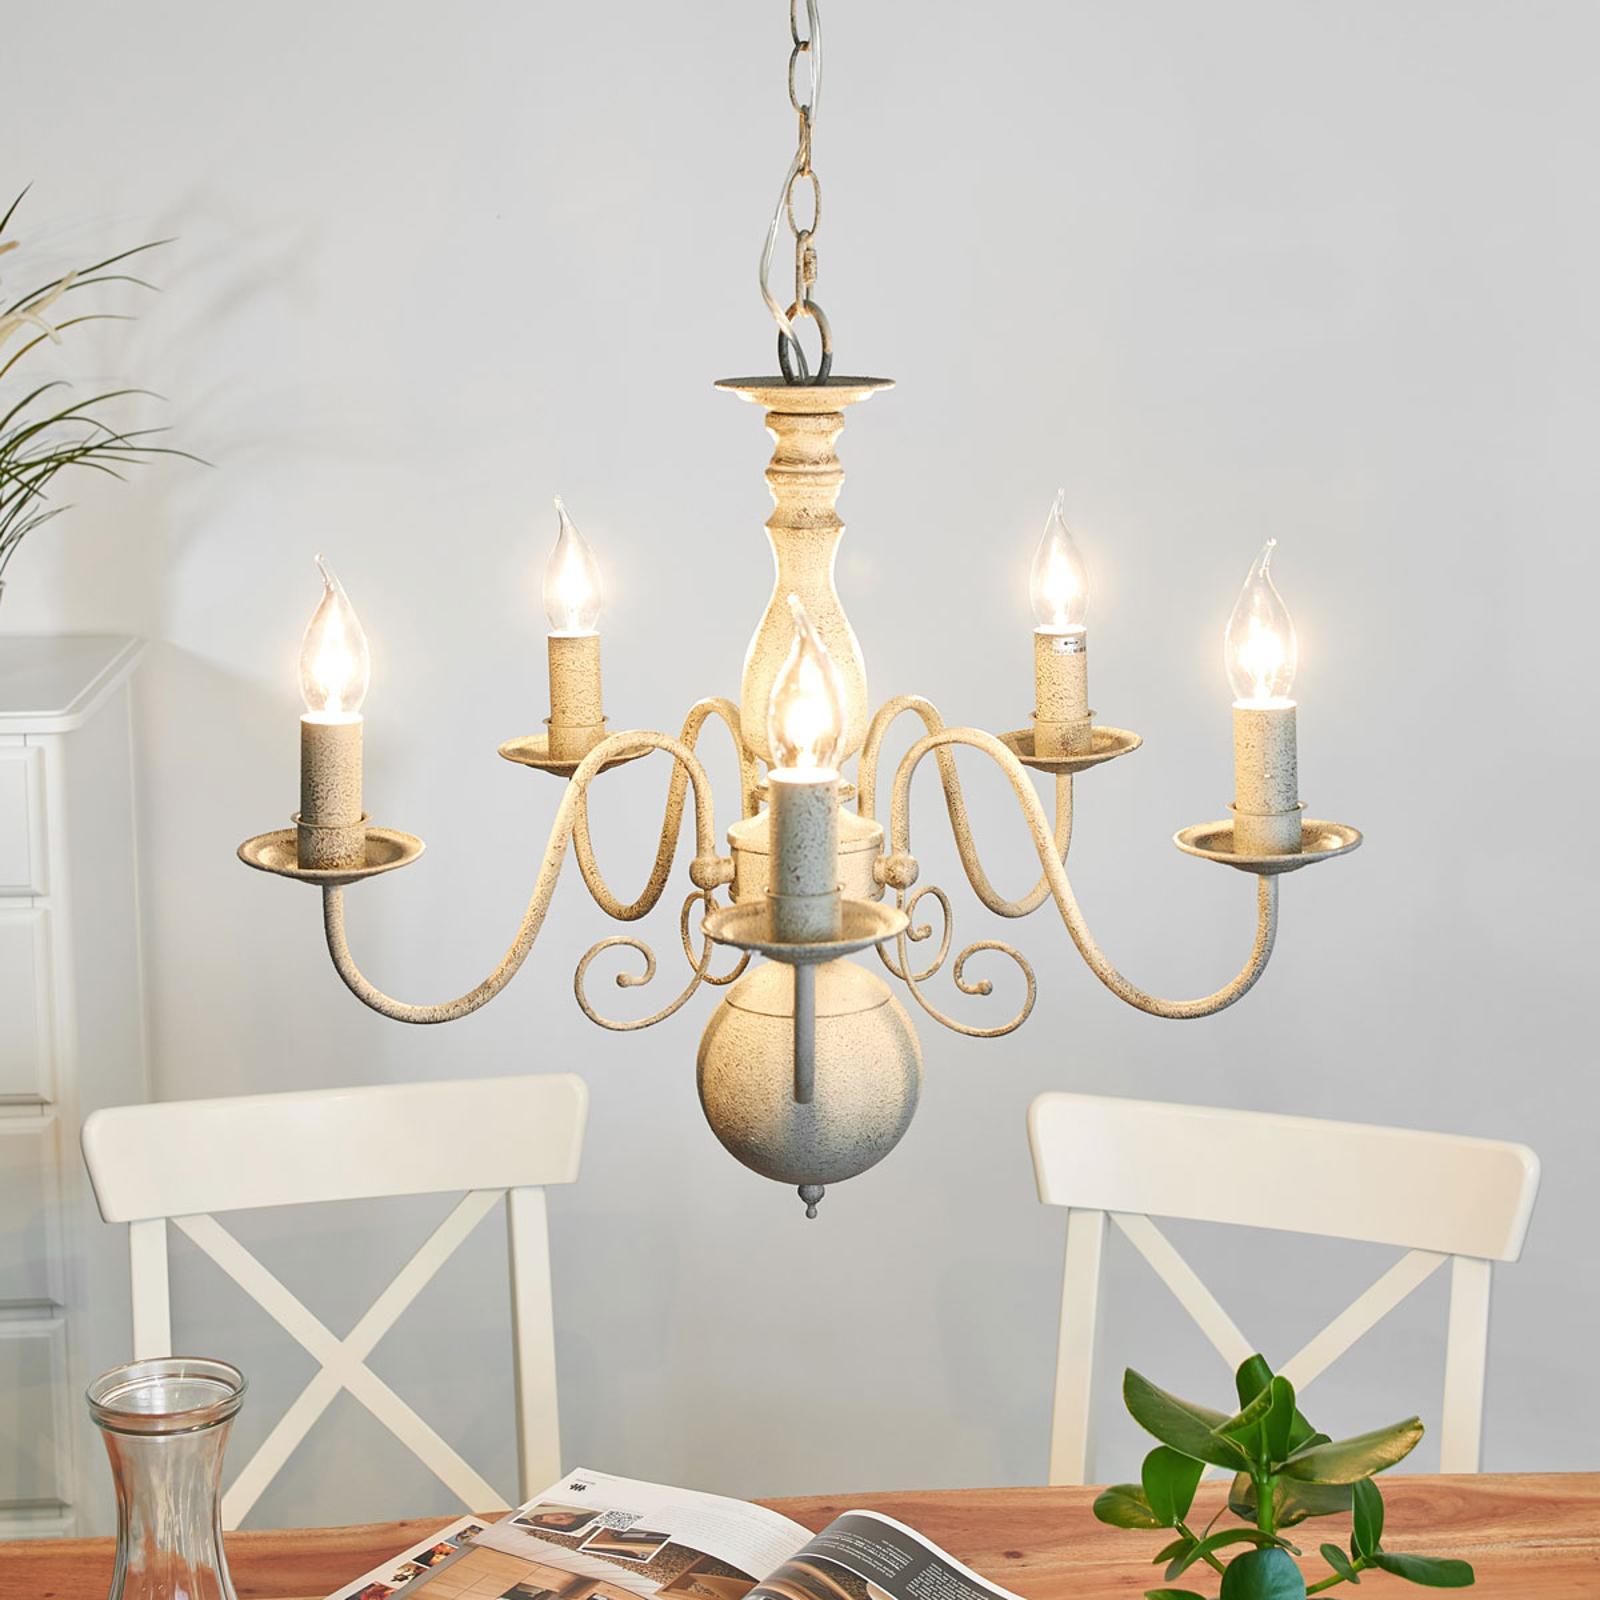 5-lamppuinen Greythorne-kattokruunu